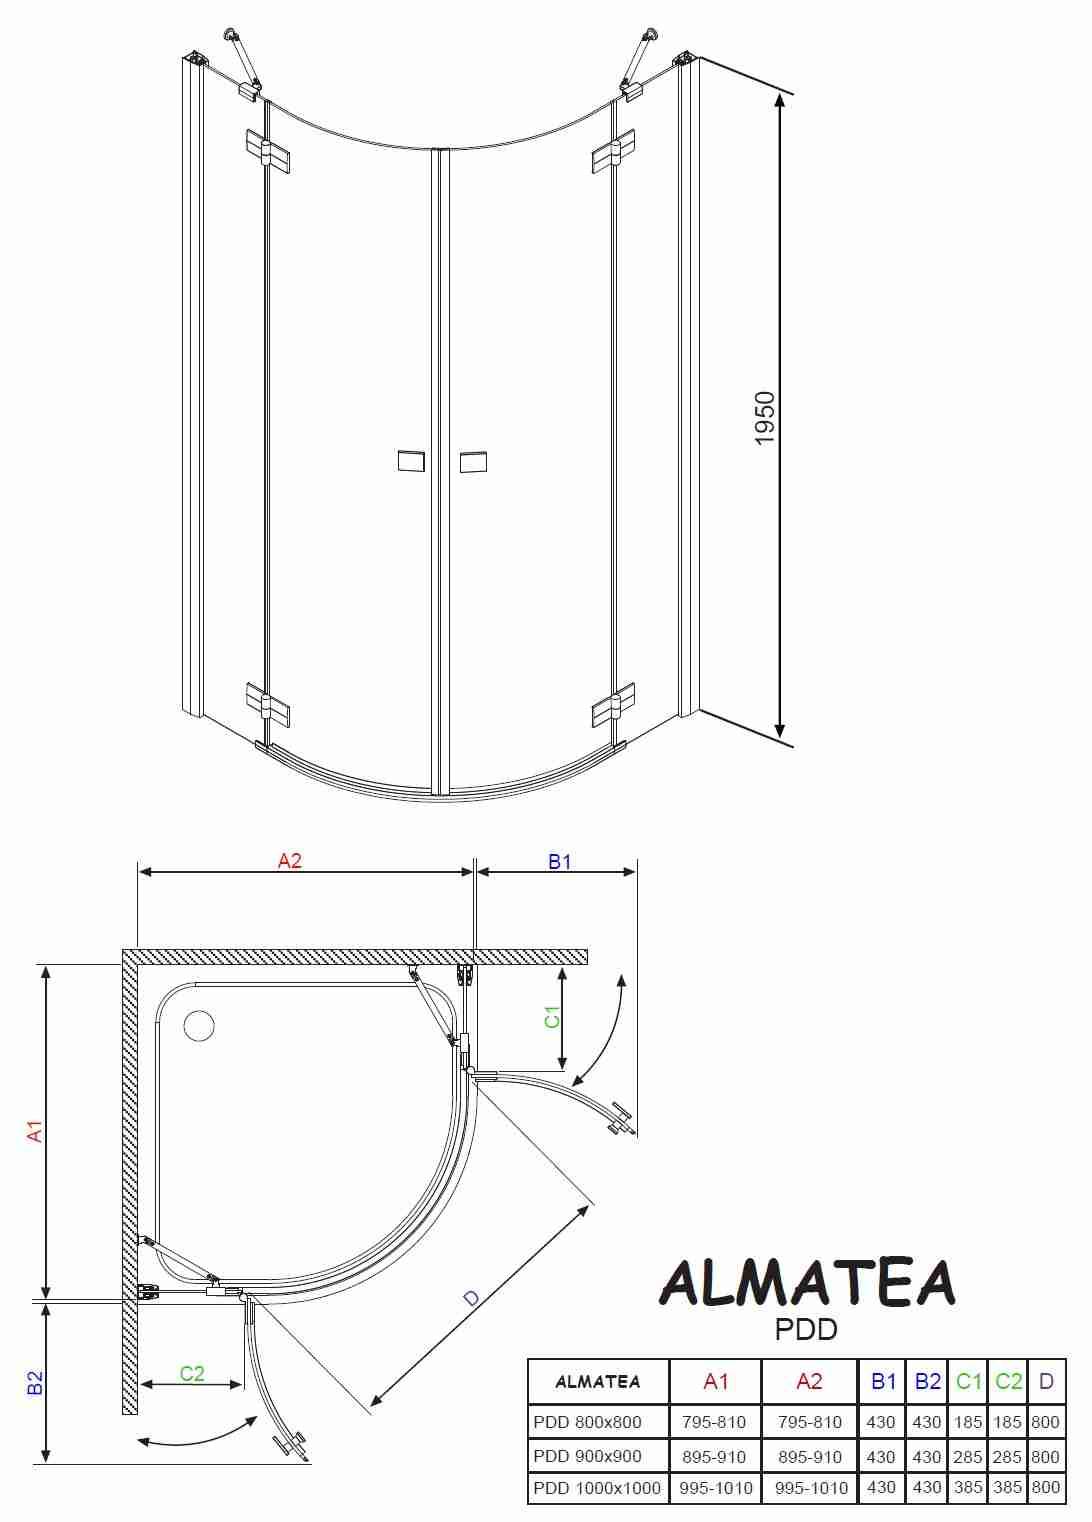 radaway almatea pdd e 100x80 zuhanykabin k dkir akci s k d k dak csaptelep. Black Bedroom Furniture Sets. Home Design Ideas